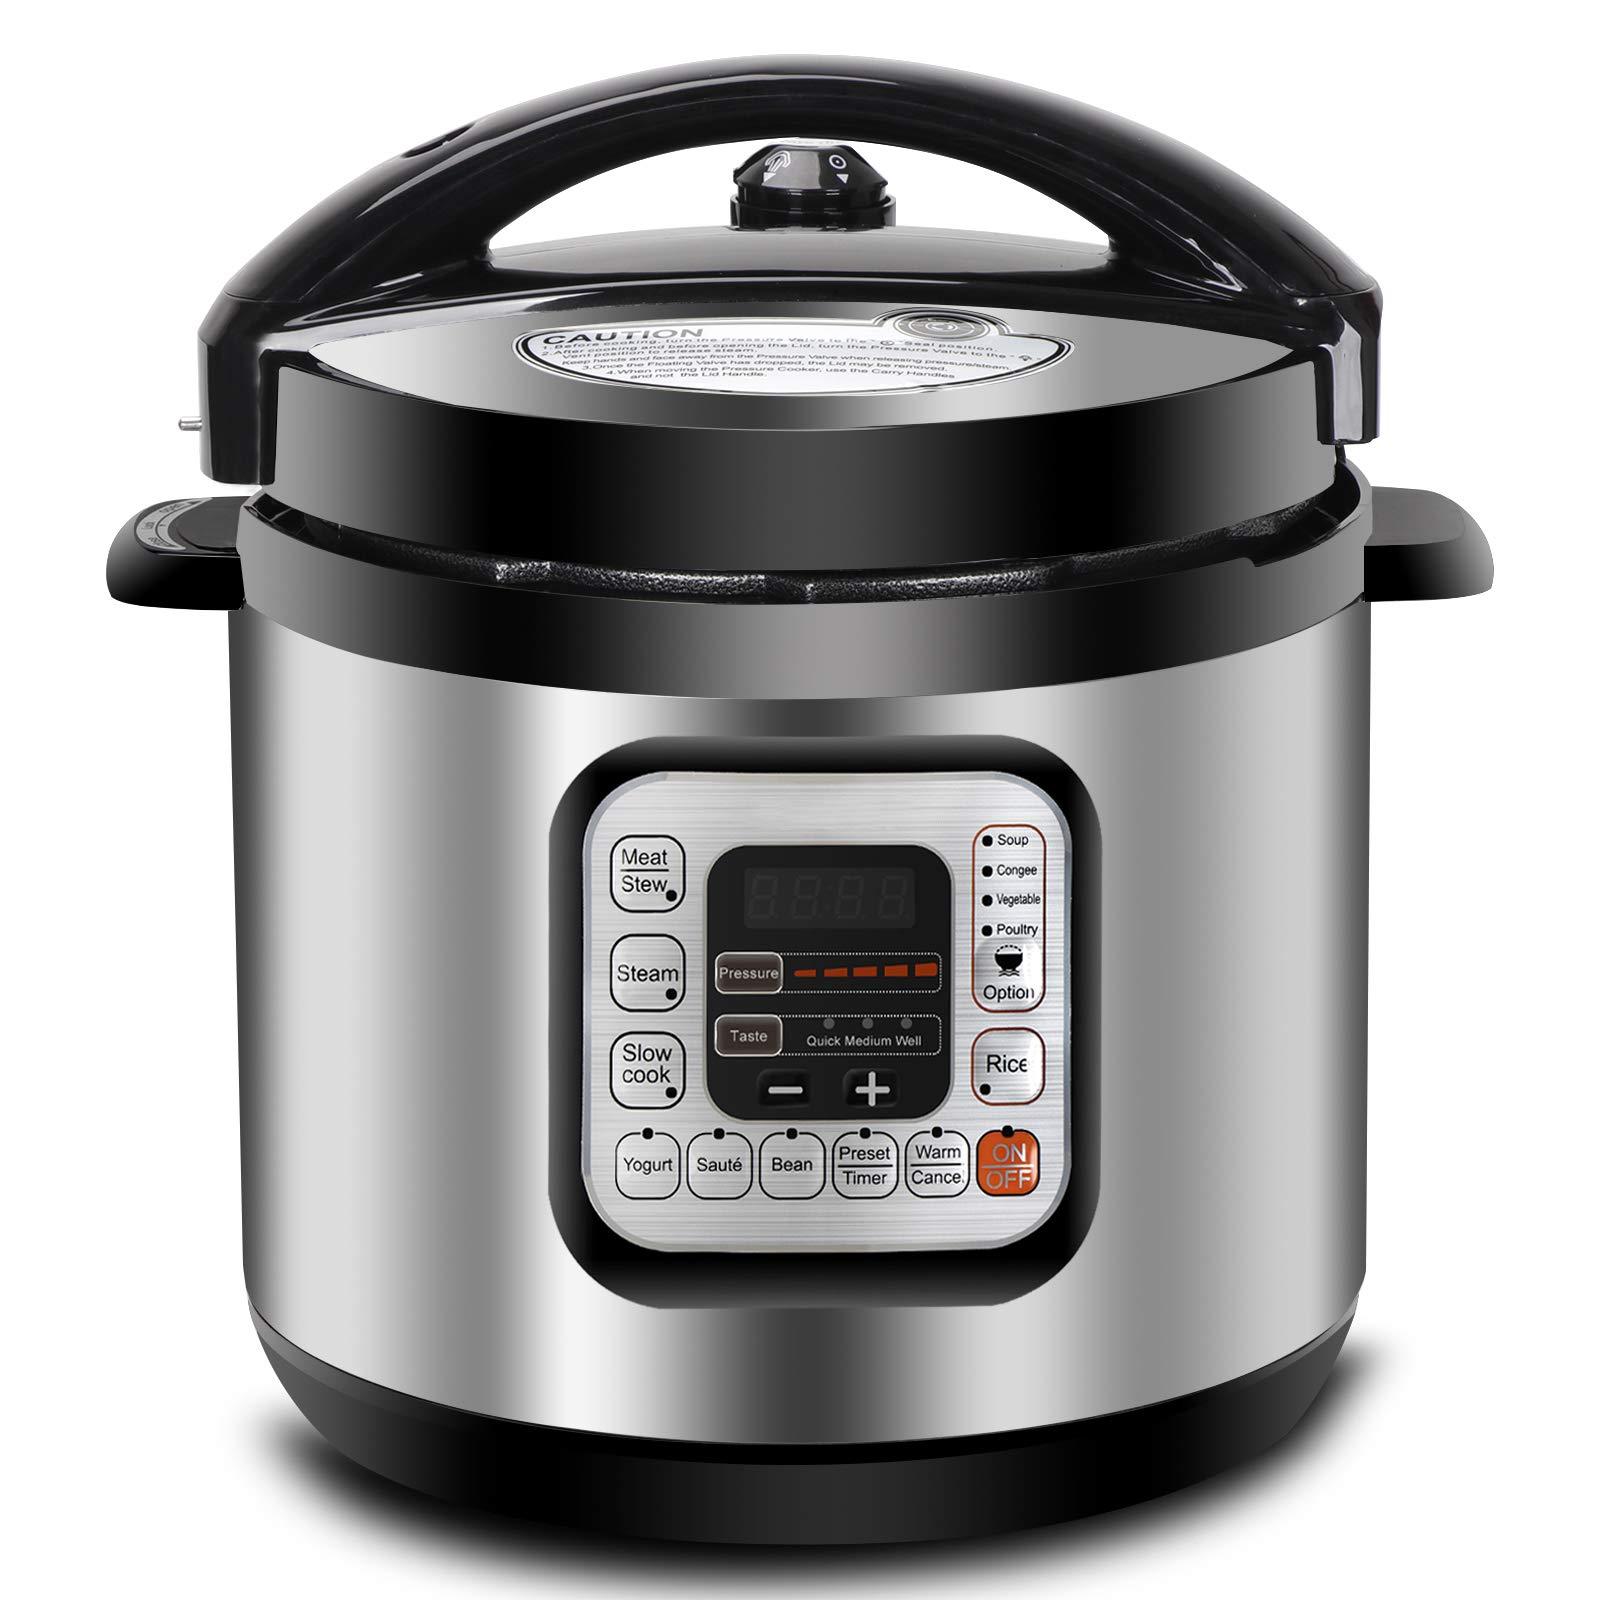 ZENY 6Qt 10-in-1 Multi-Use Pressure Cooker Programmable with Aluminium Alloy Pot, Rice Cooker, Slow Cooker, Yogurt Maker, Bean Cooker, Meat Stew, Sauté Steamer & Warmer